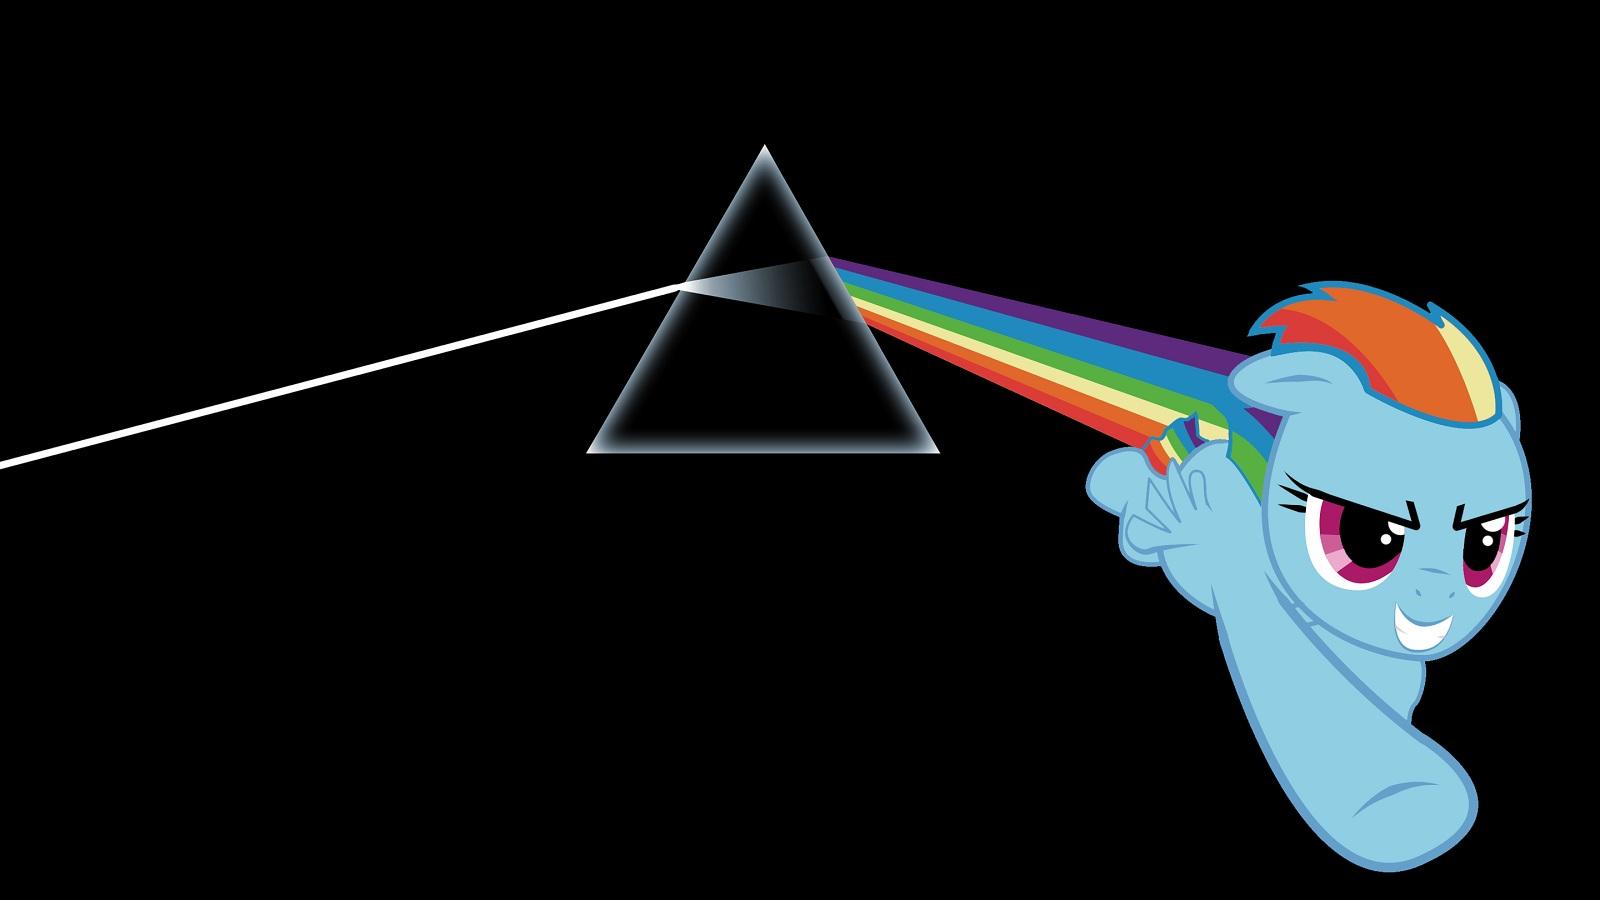 Floyd My Little Pony The Dark Side Of The Moon Rainbow Dash wallpaper 1600x900